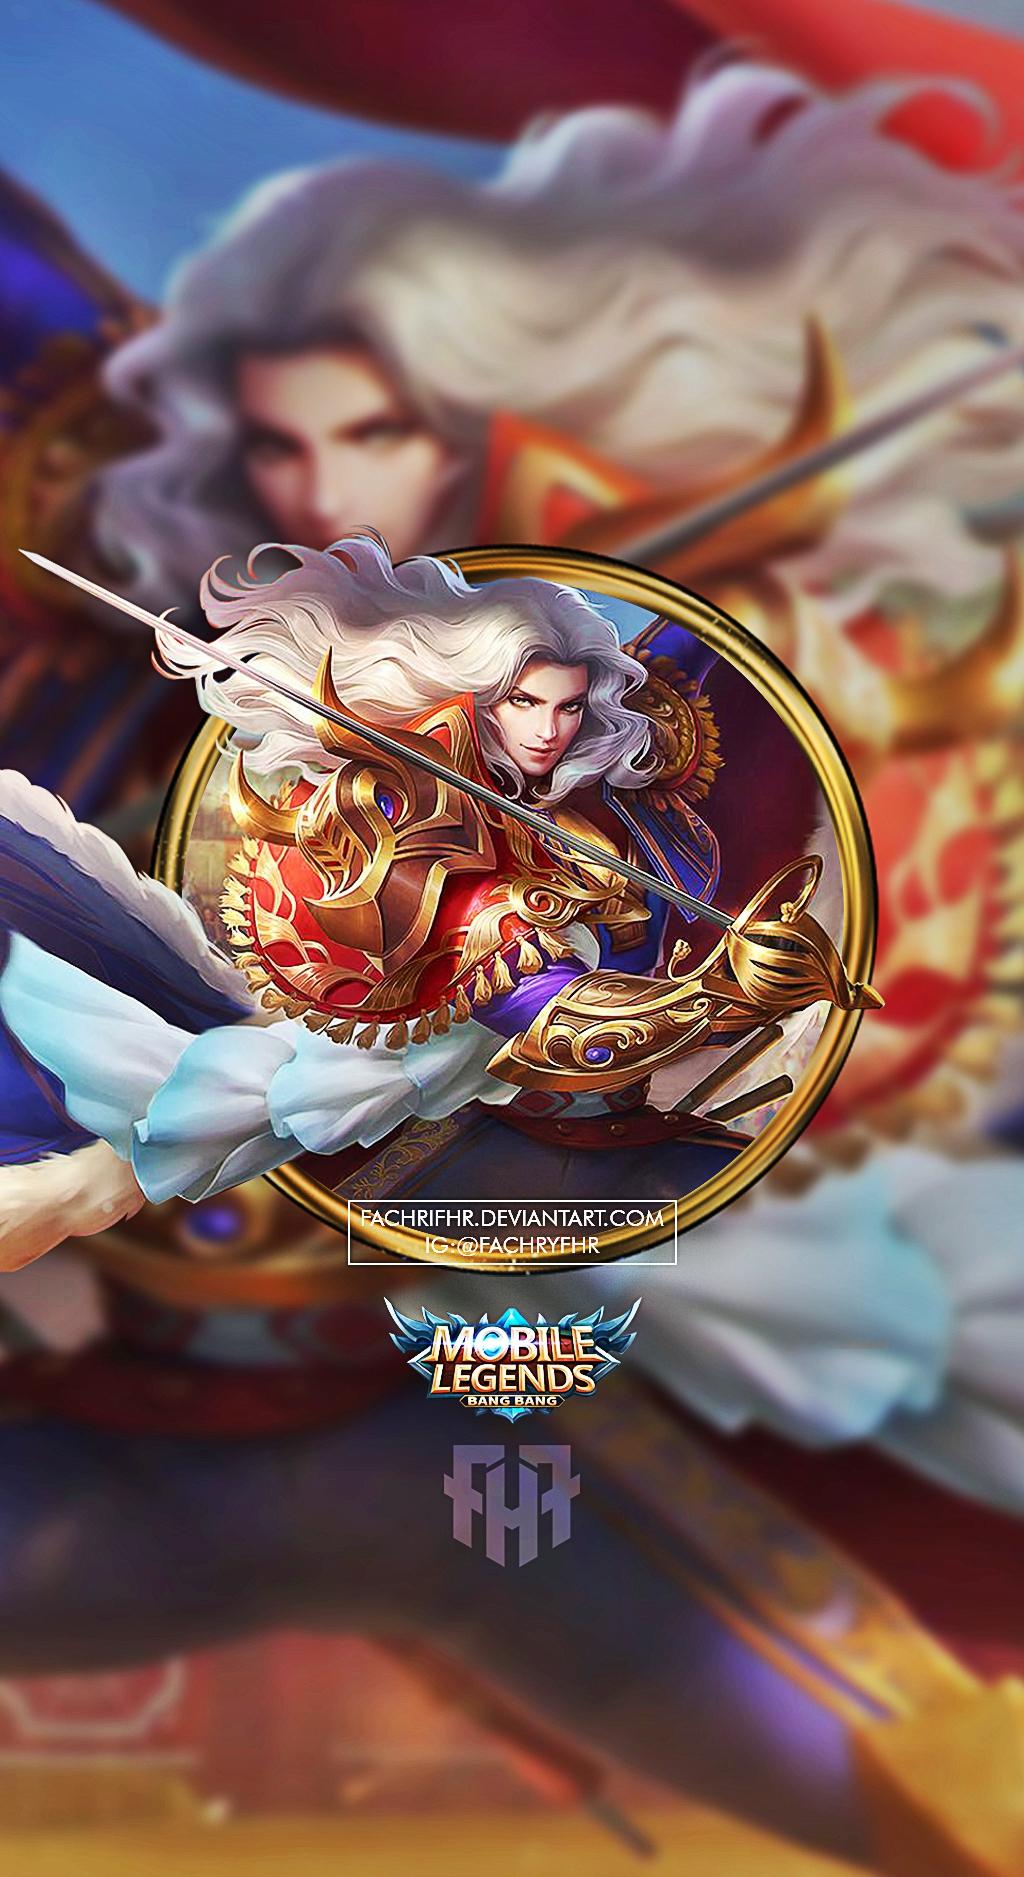 Wallpaper Phone Lancelot Royal Matador By FachriFHR On